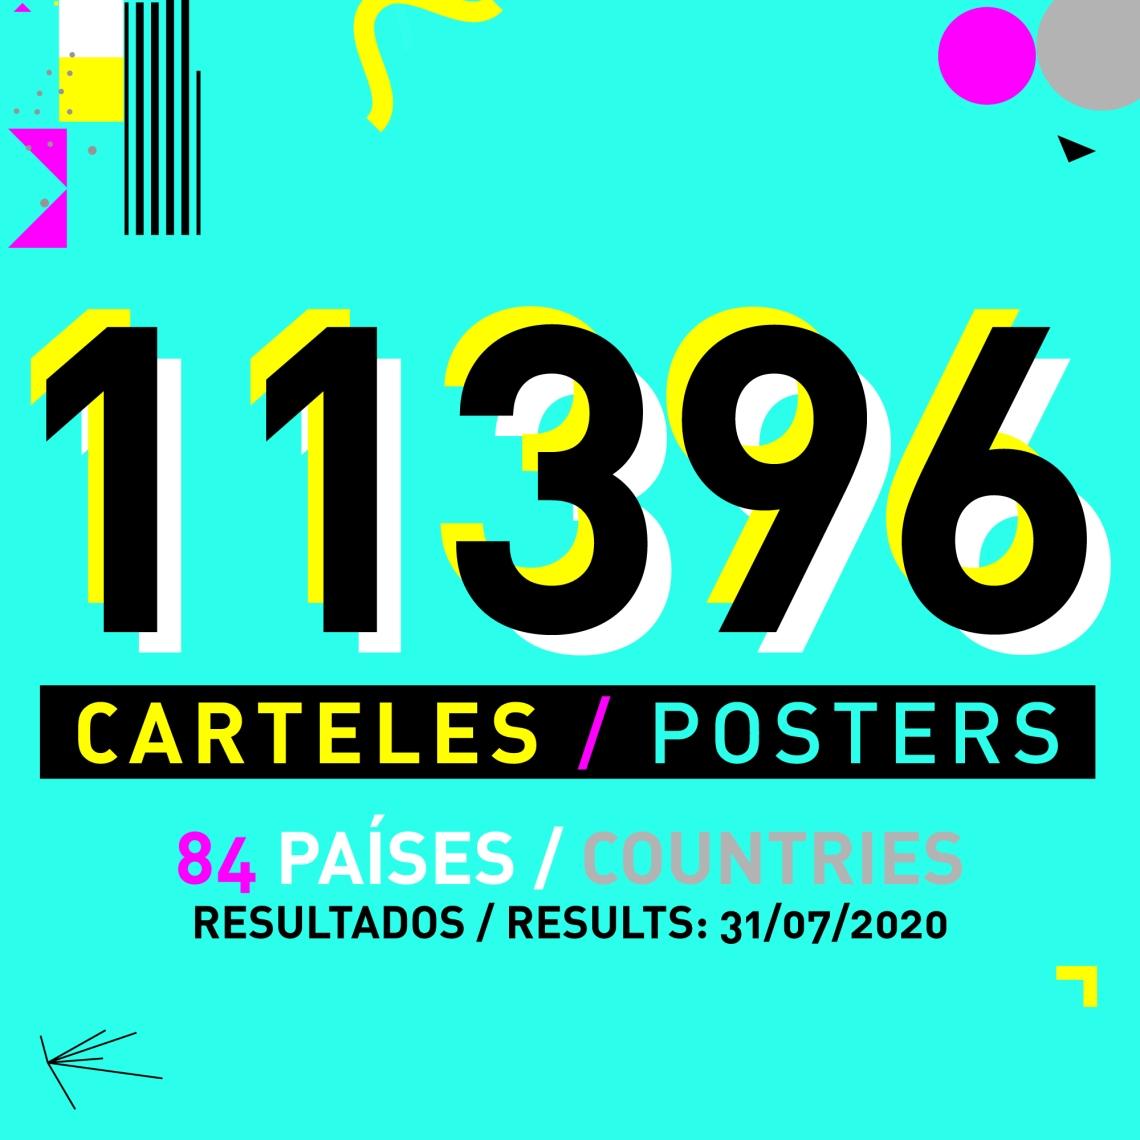 11398-carteles epb2020